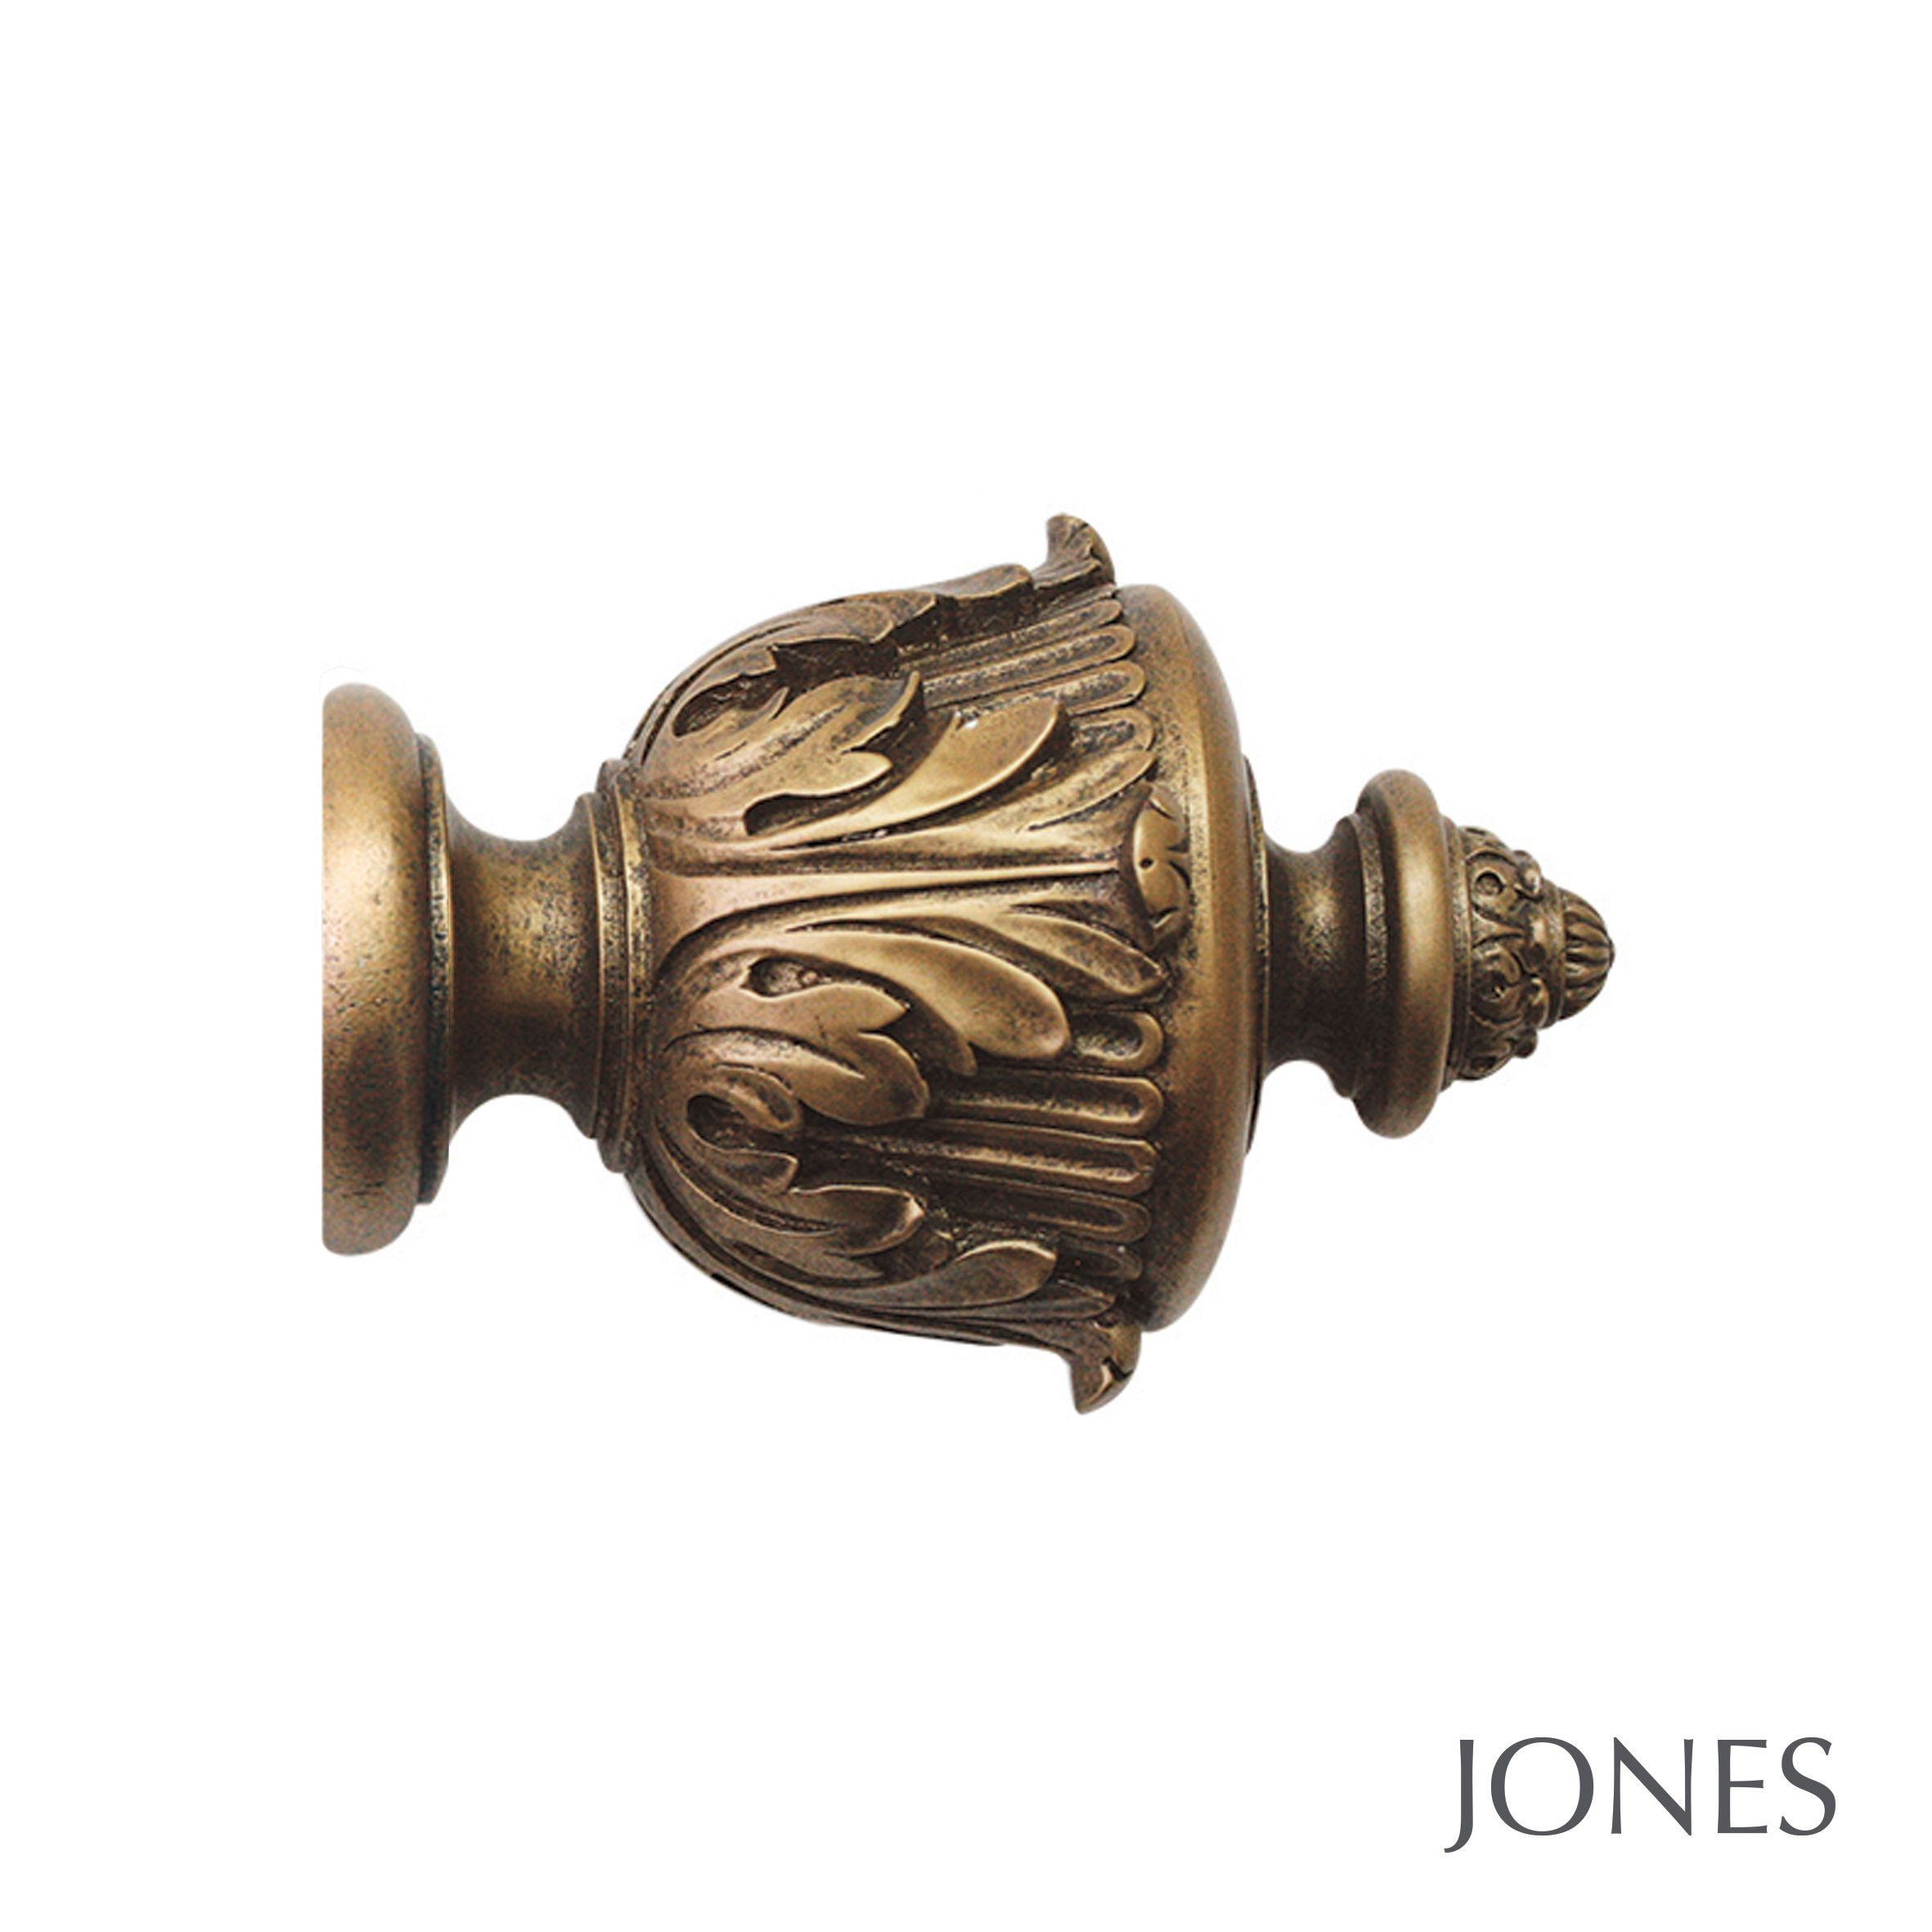 63mm Jones Grande Acanthus Finial antique gold